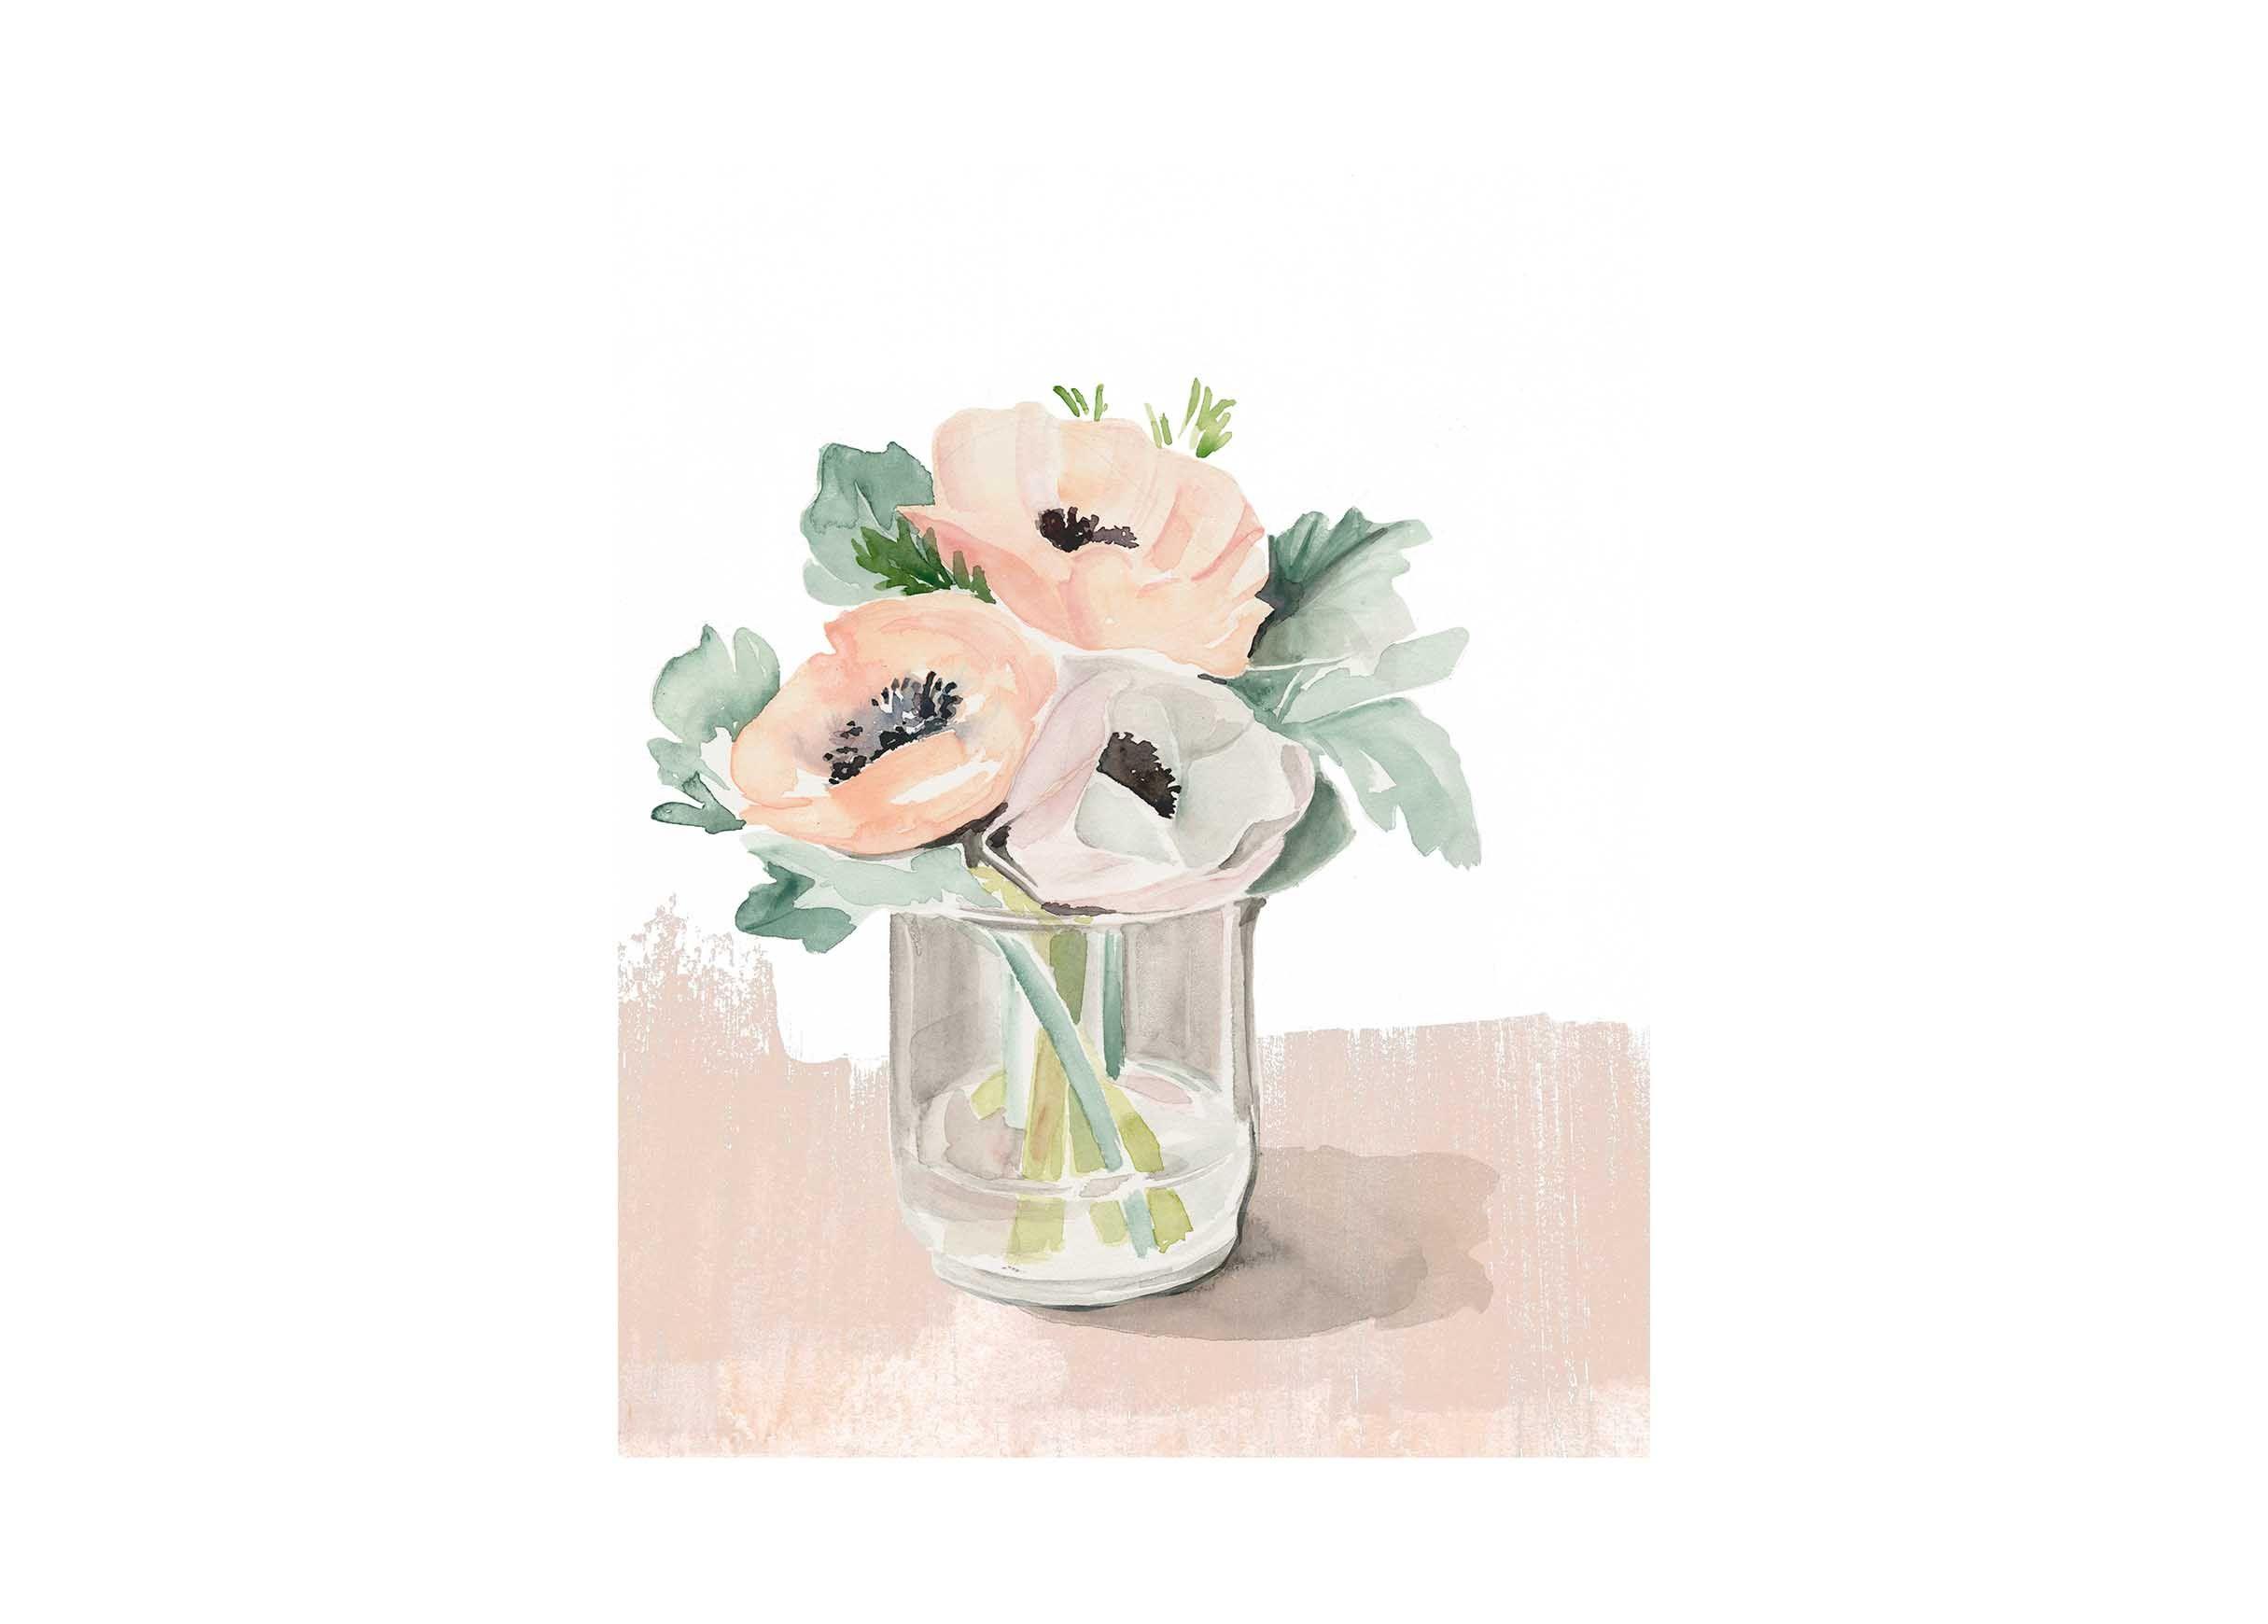 Bud Vase I Bud vases, Flower bouquet vase, Framed artwork